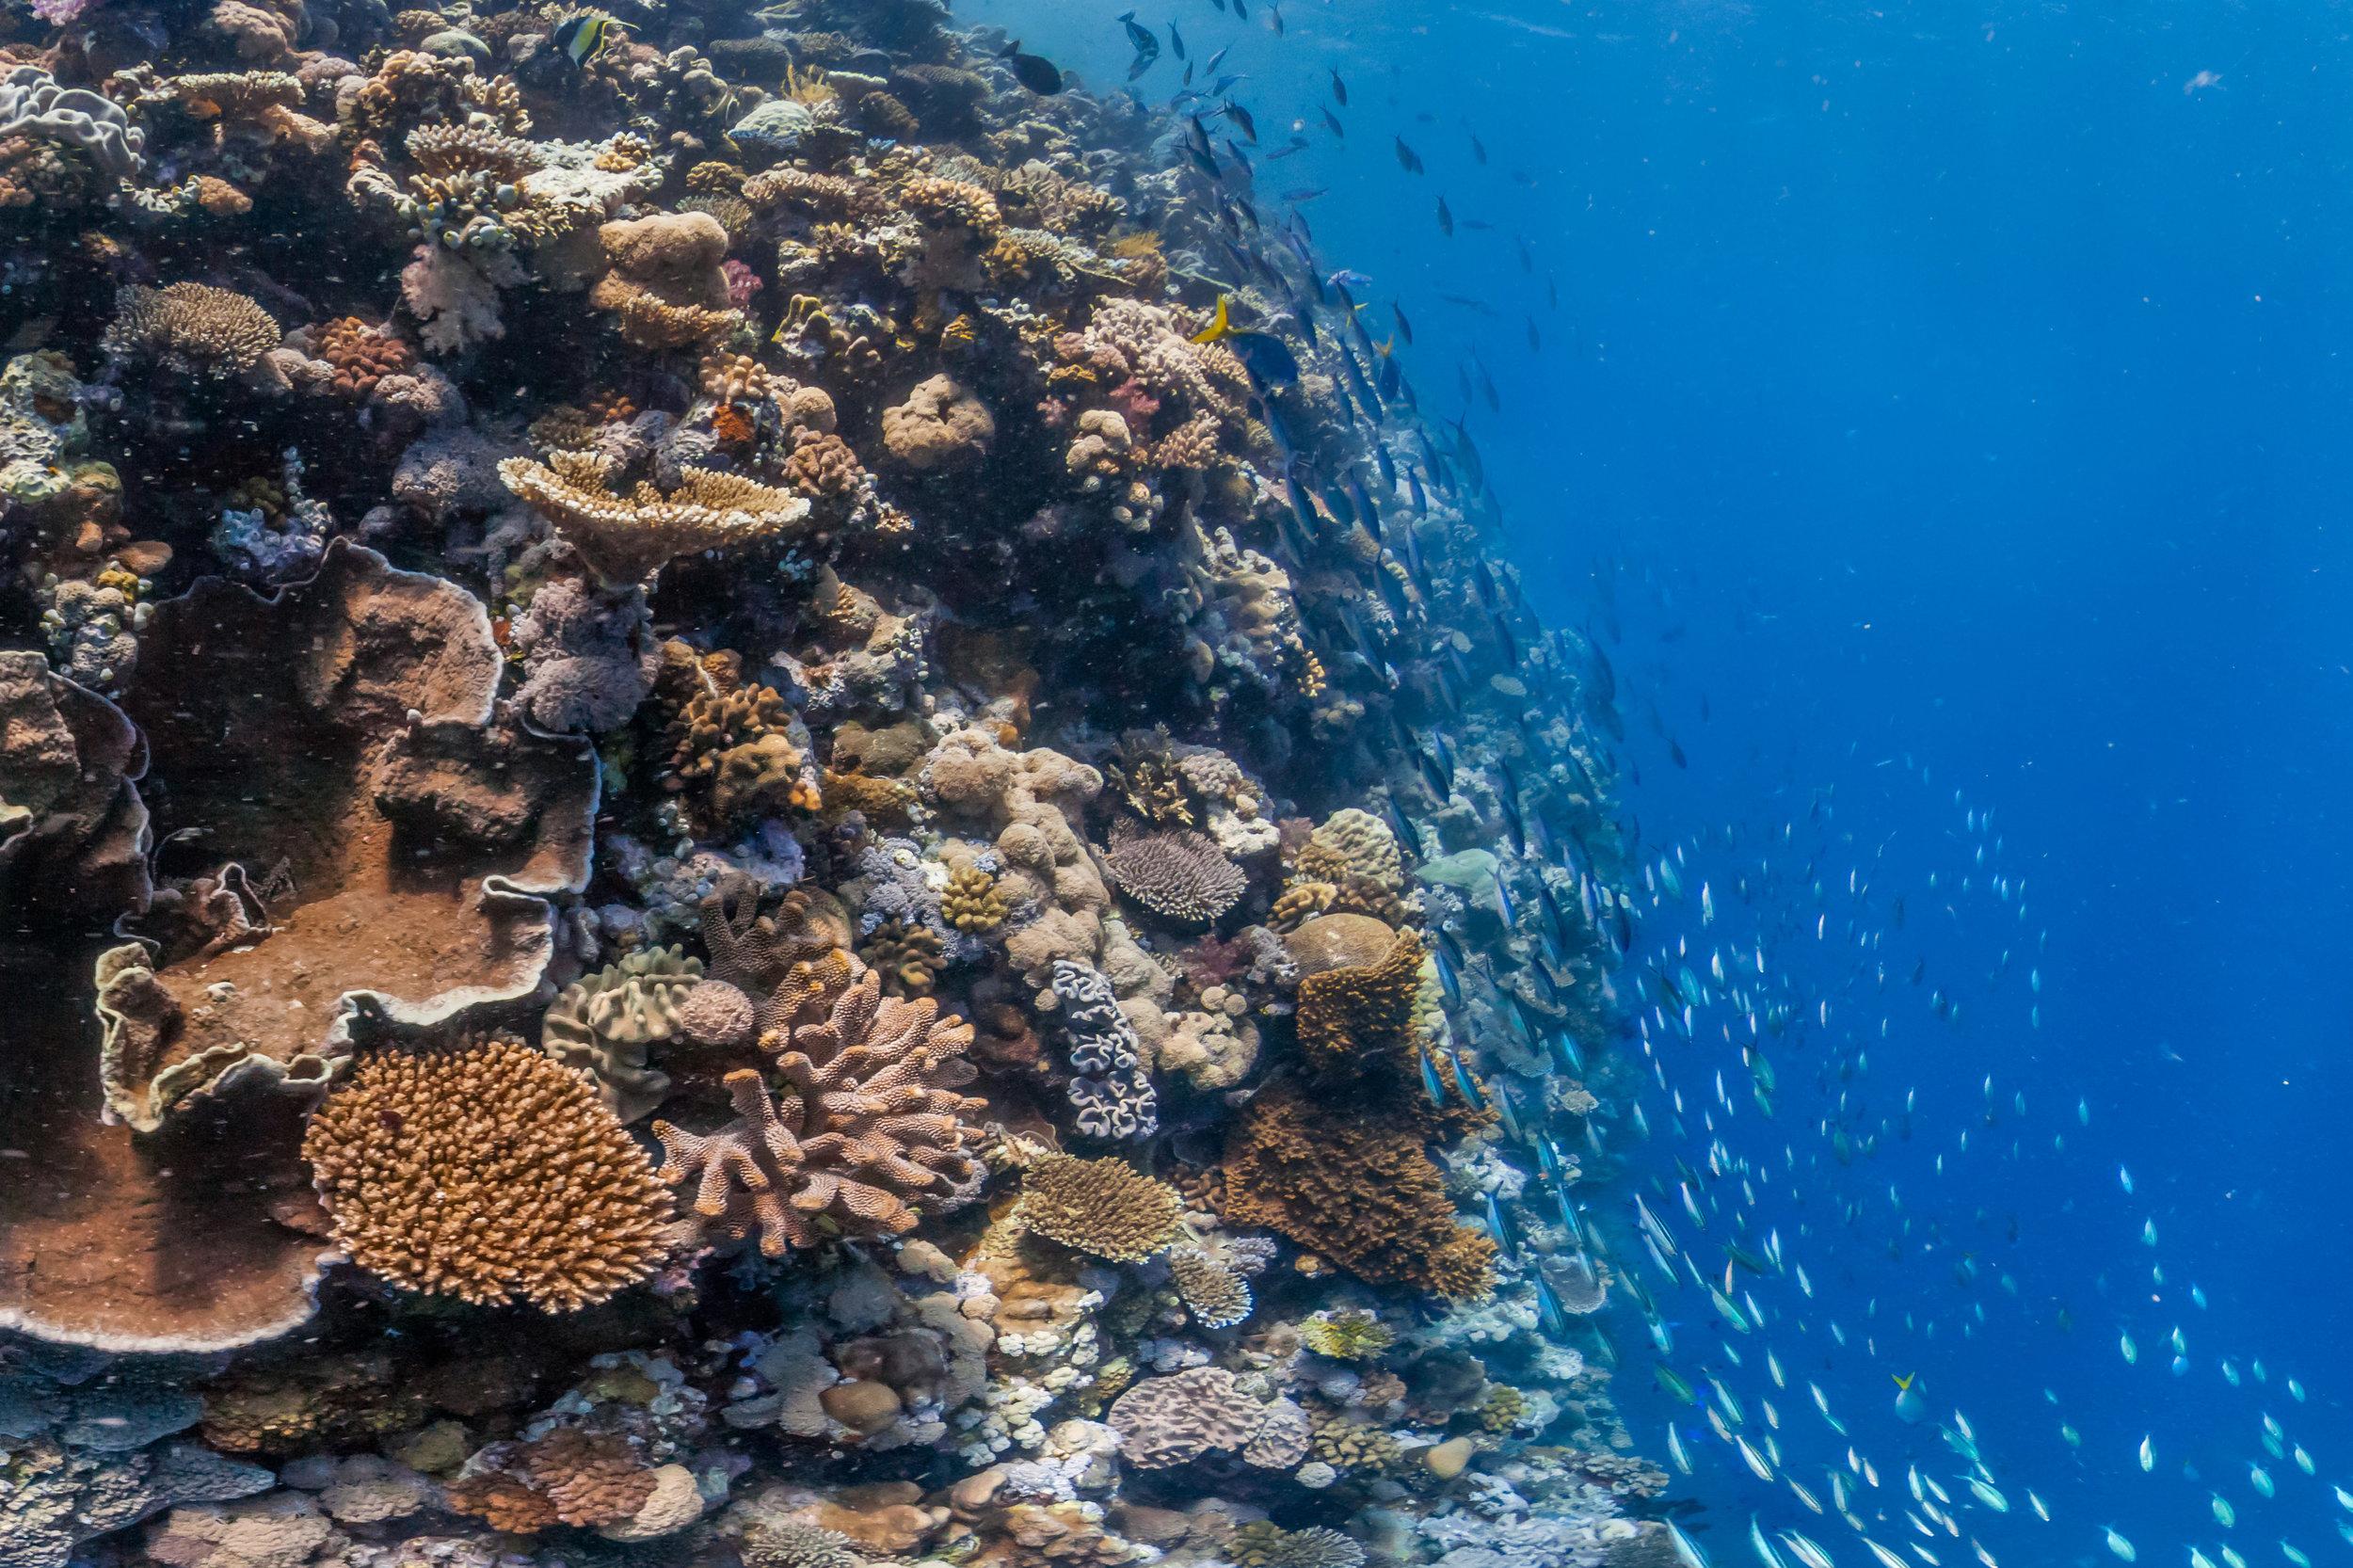 NORTH BROKEN PASSAGE, Great barrier reef CREDIT: THE OCEAN AGENCY / XL CATLIN SEAVIEW SURVEY